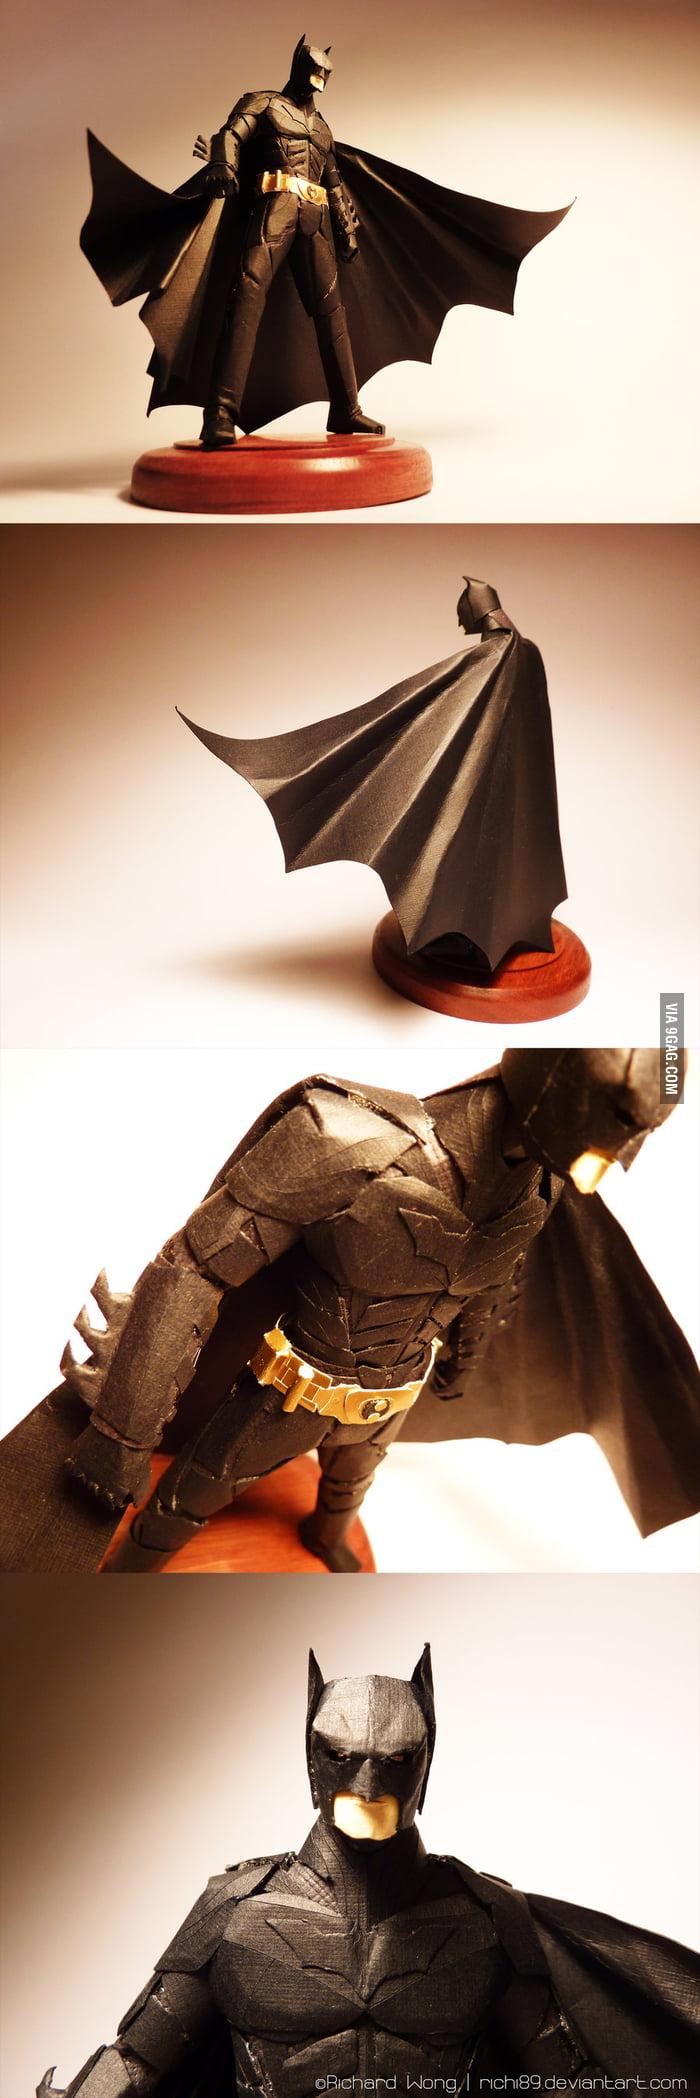 What my friend did last week - Paper Batman